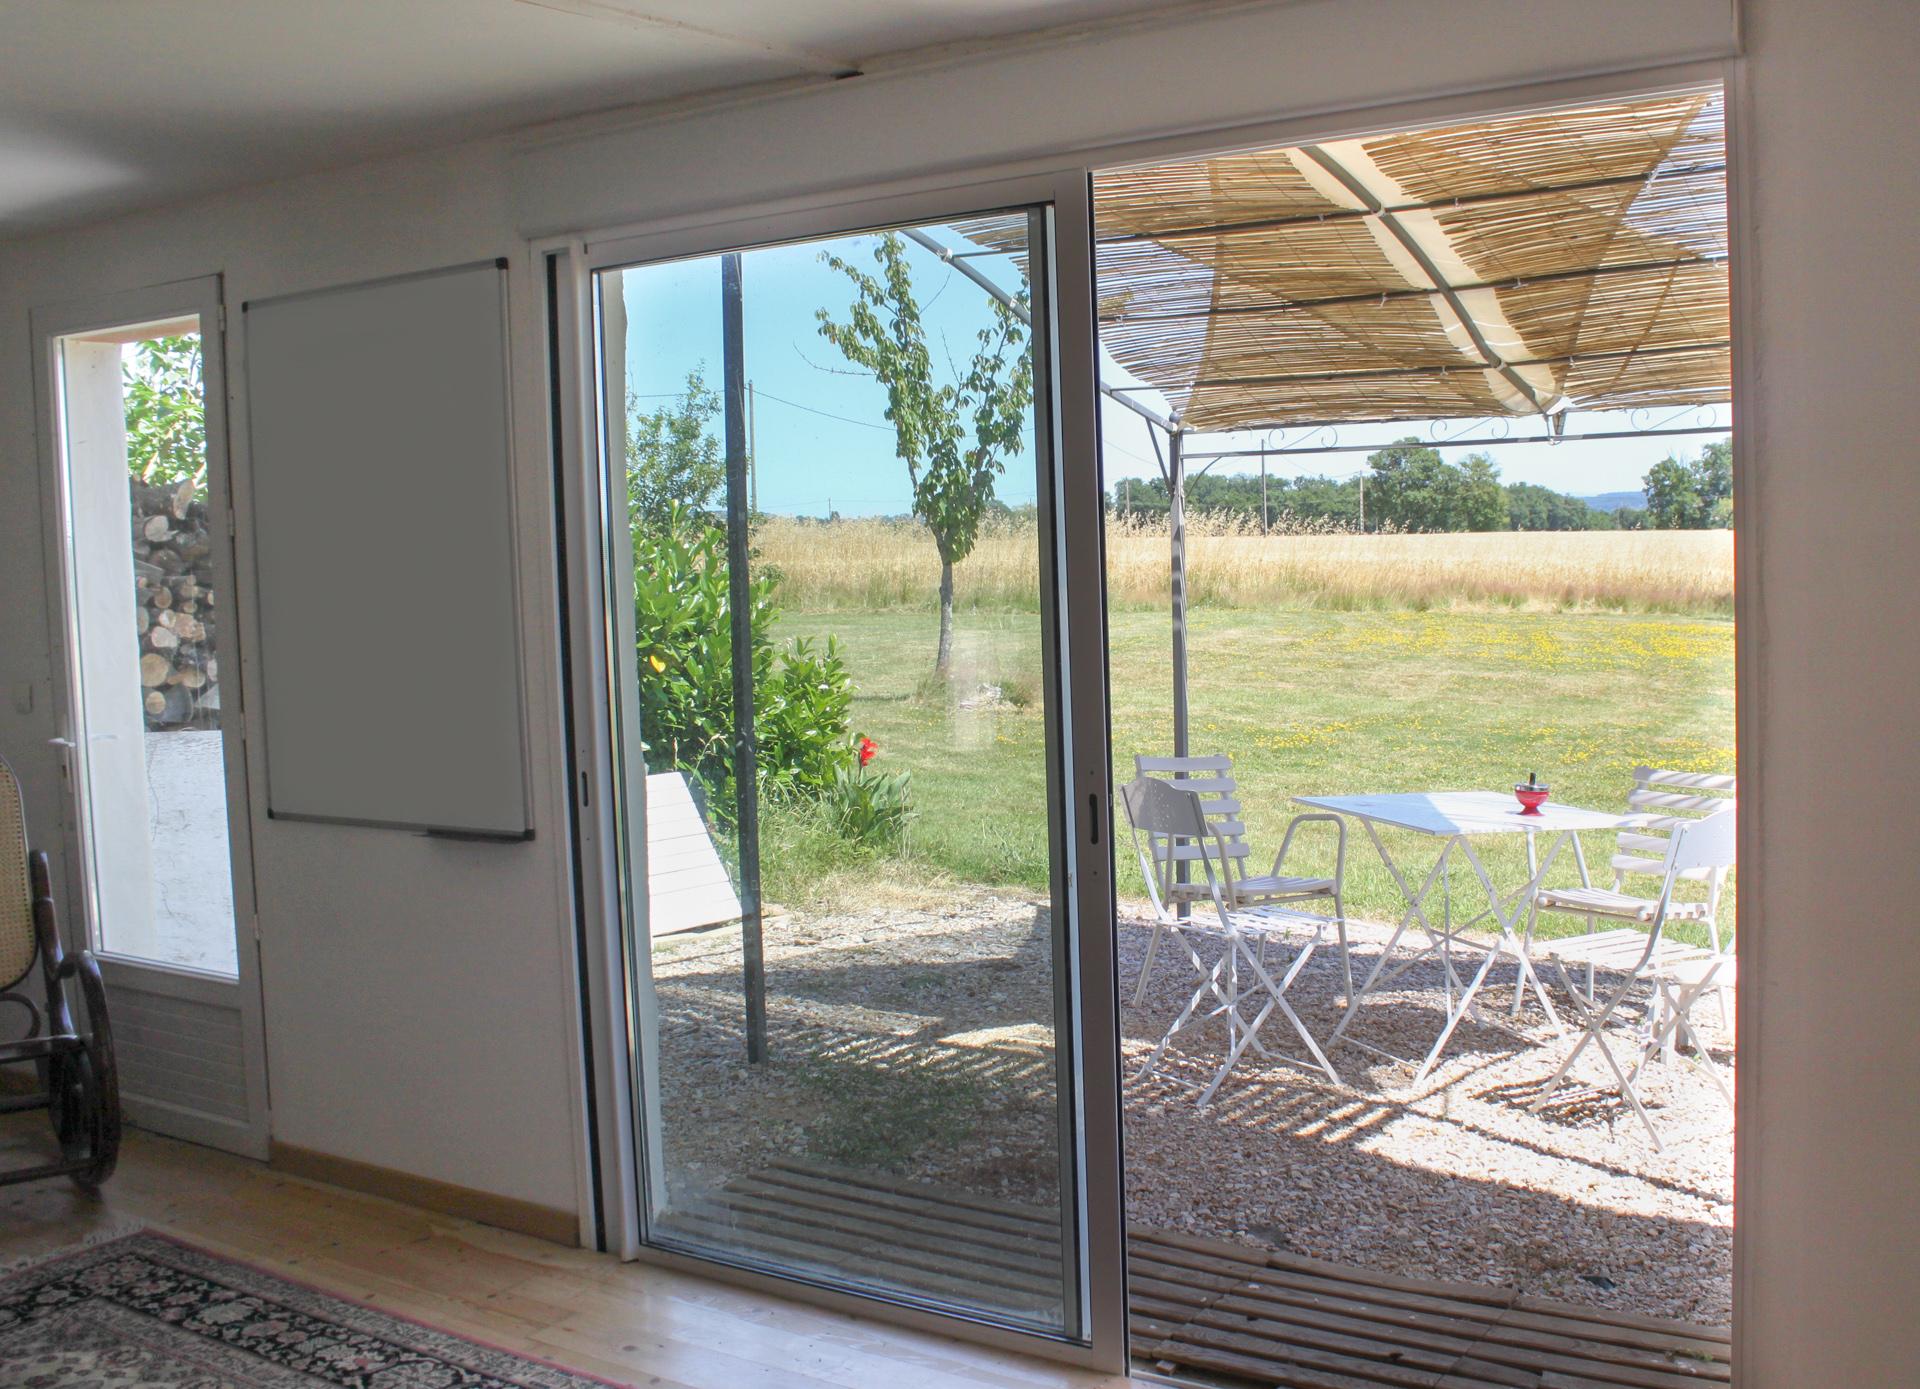 Ombrassa baie vitrée sur terrasse